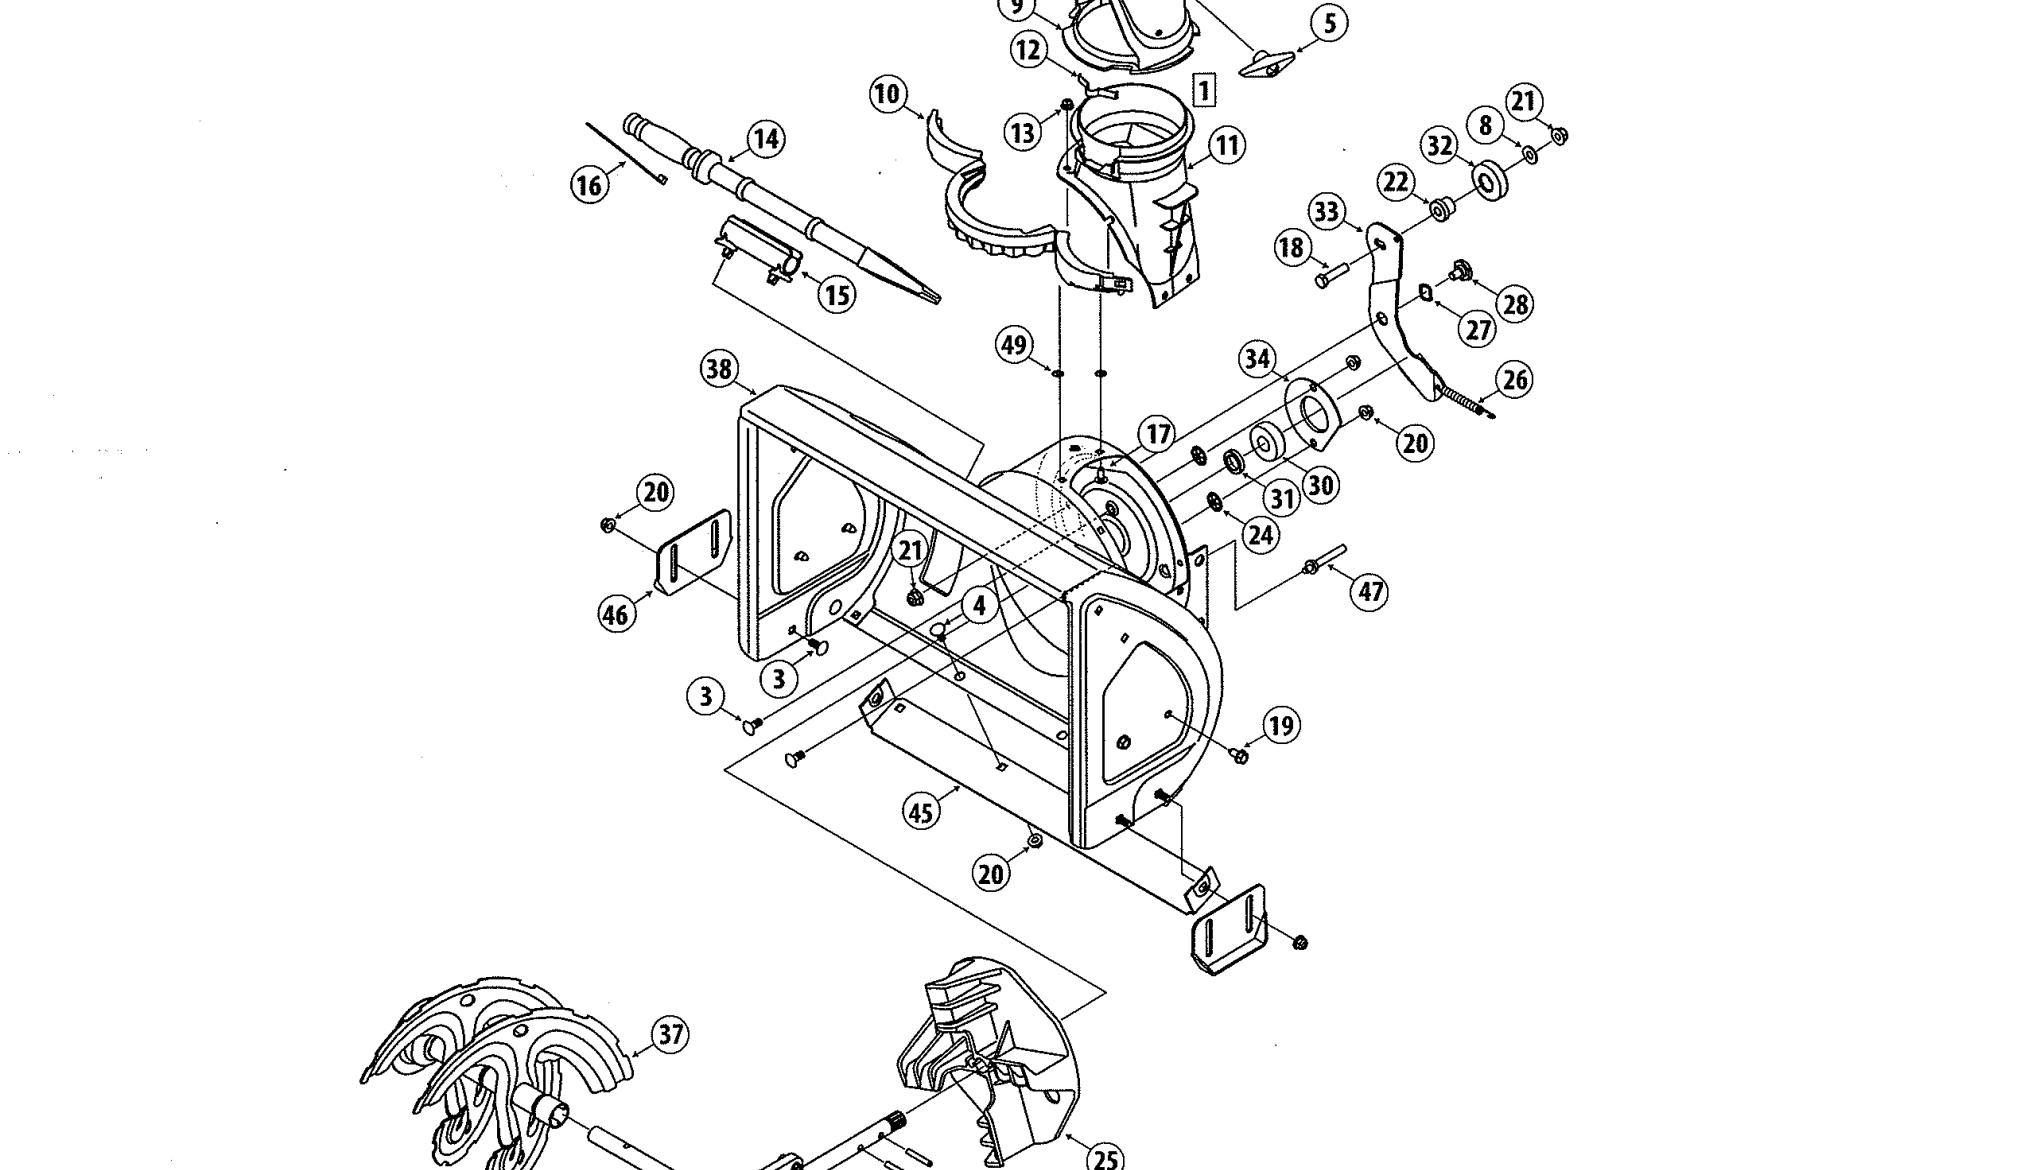 Model 247881980 Home Decor Decals Craftsman Snow Blower